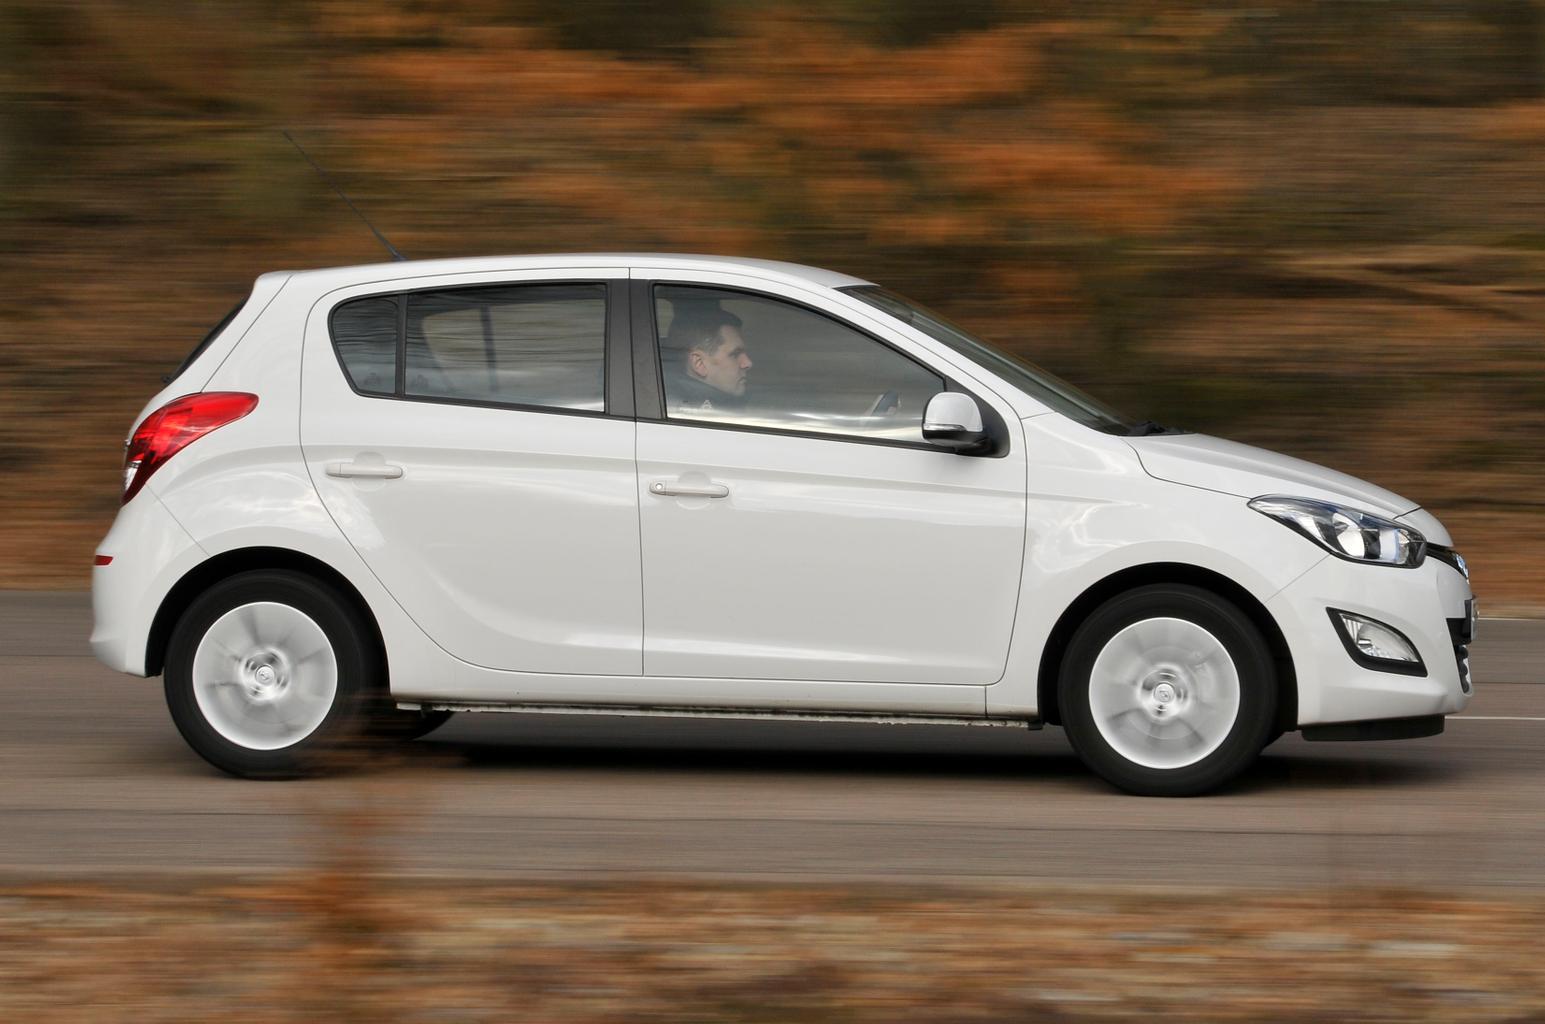 Used Ford Fiesta vs Renault Clio vs Hyundai i20